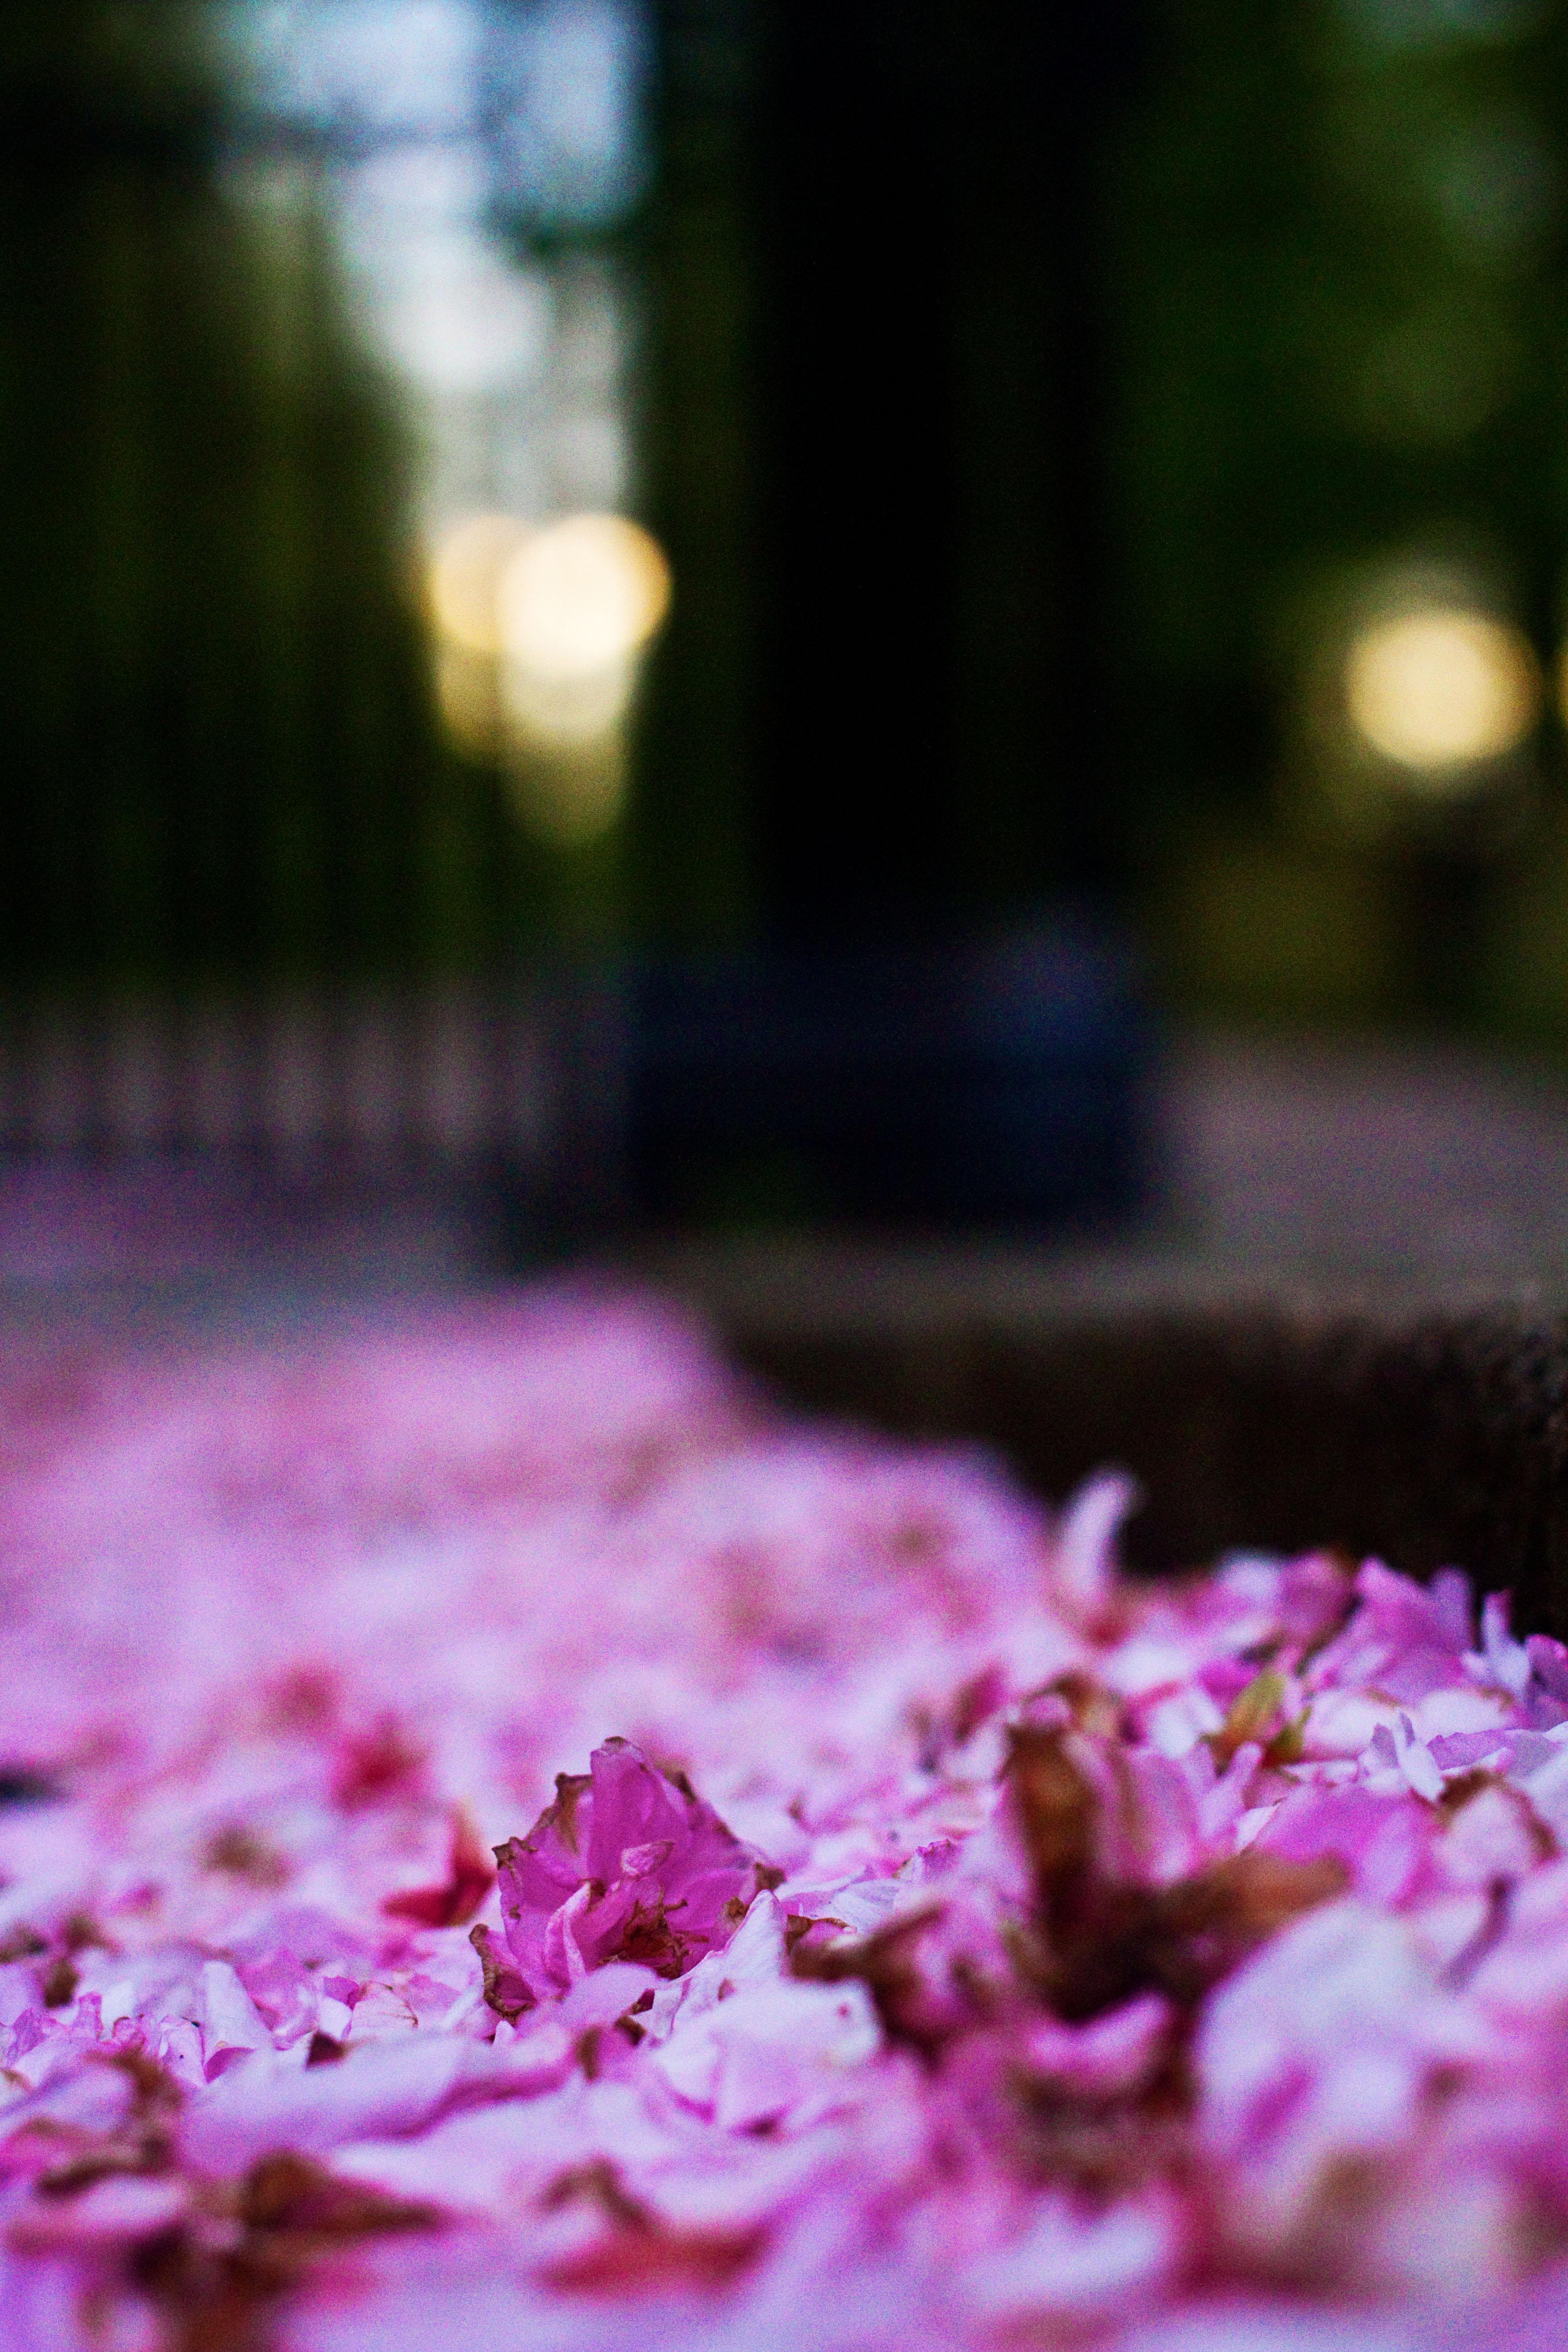 Dropped blossom on floor in Haslam Park Preston